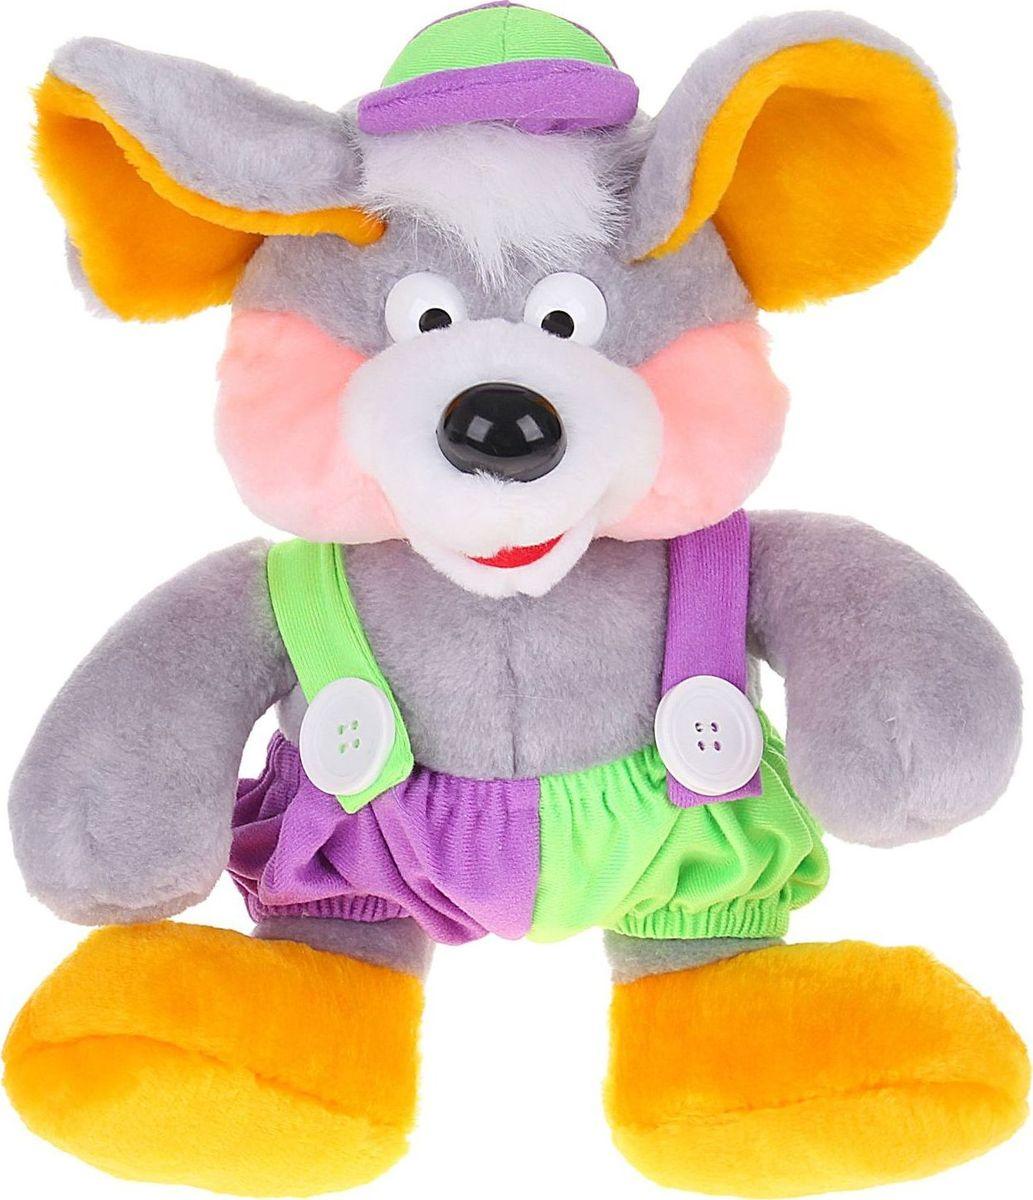 Sima-land Мягкая игрушка Мышонок Клайд 40 см sima land мягкая игрушка собака хаски 40 см